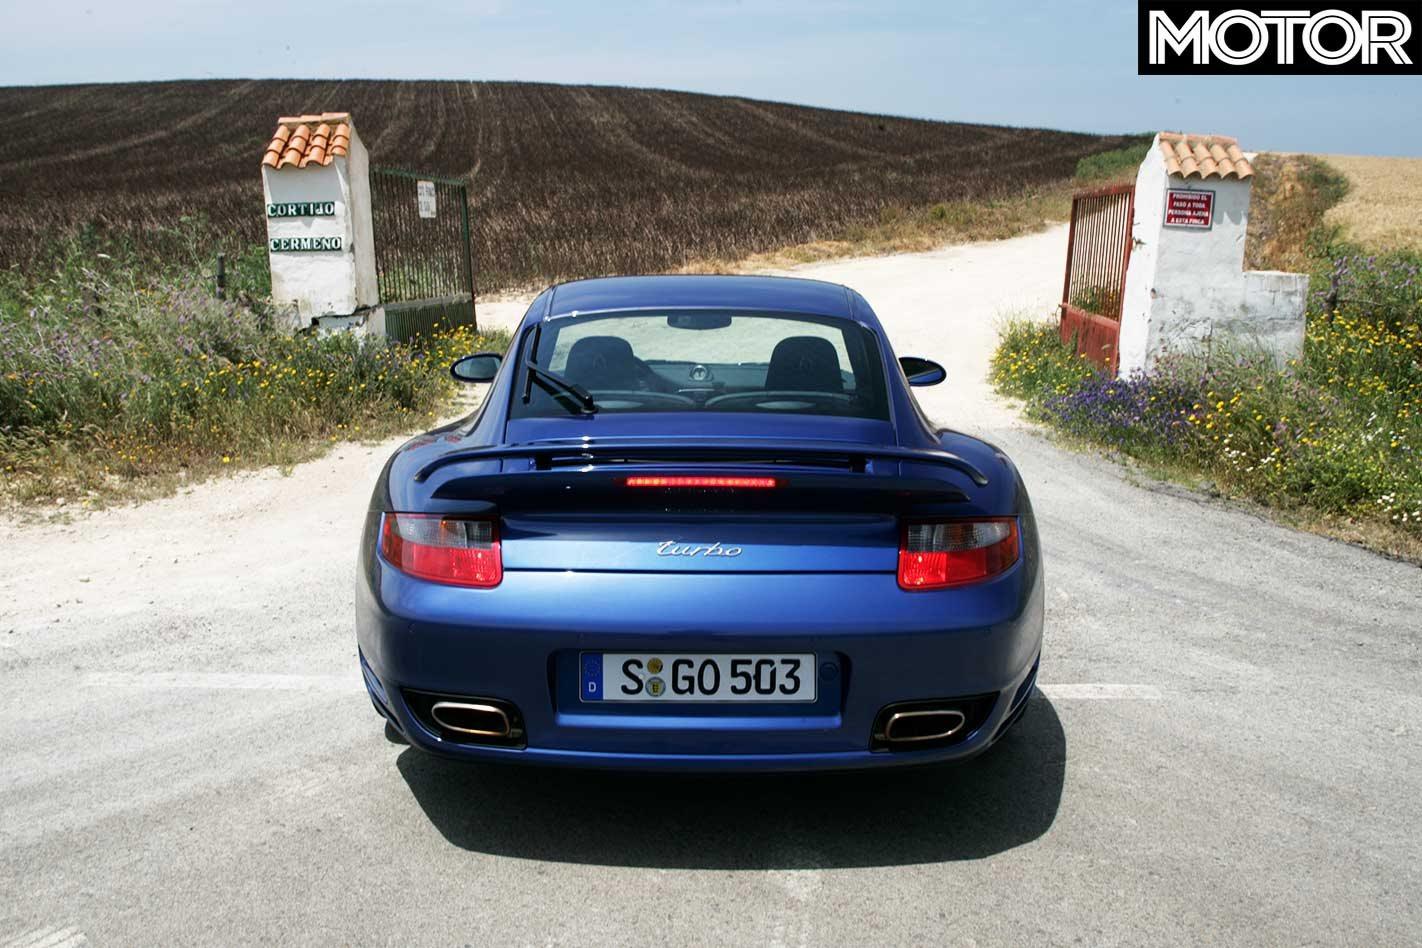 Porsche 997 Turbo >> 2006 Porsche 997 911 Turbo Review Classic Motor